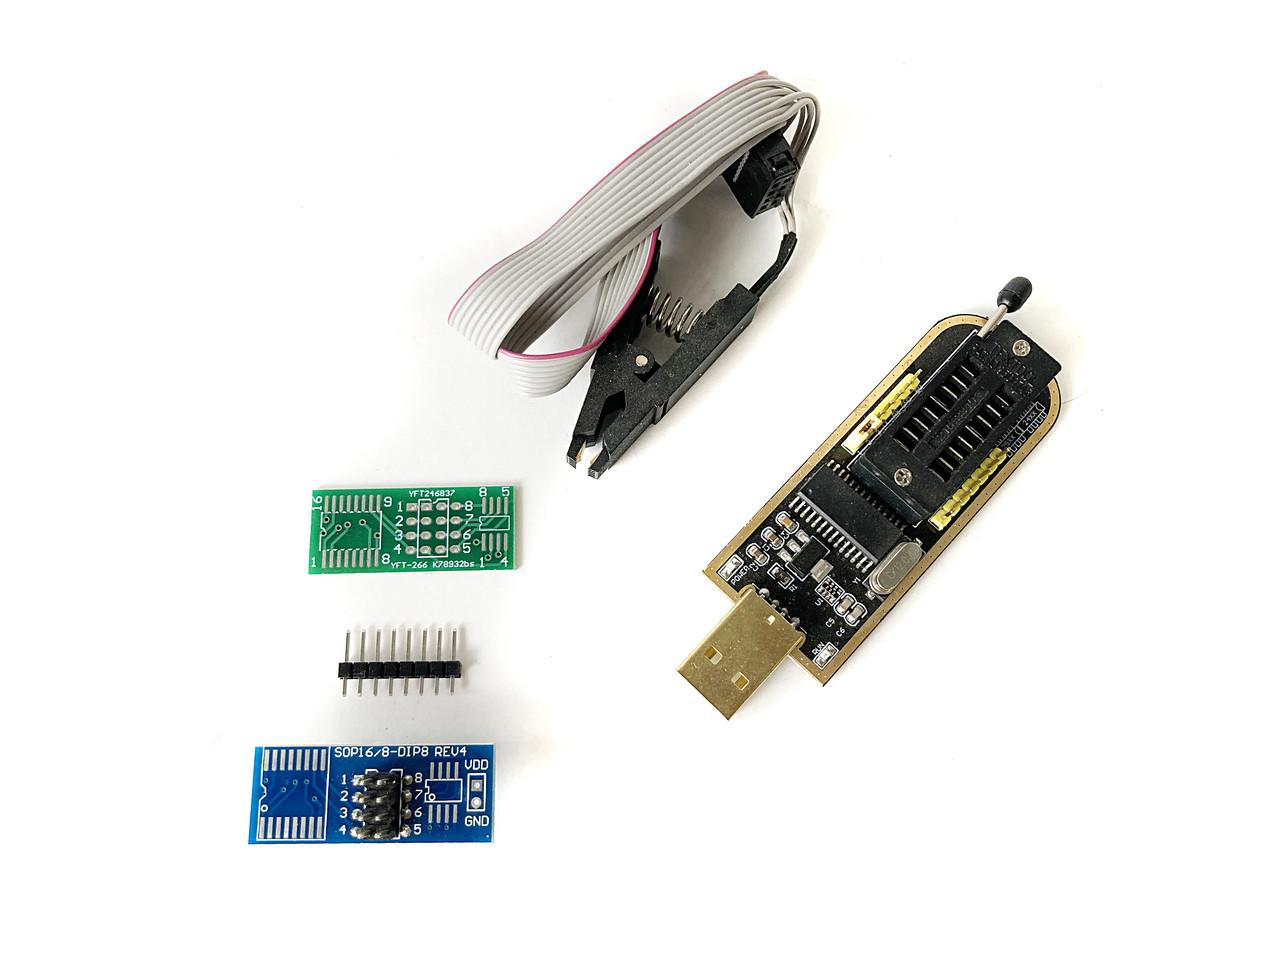 Программатор CH341A, USB, поддержка микросхем SOIC8, SOP8, EEPROM серий 93Сxx, 25Cxx, 24Cxx